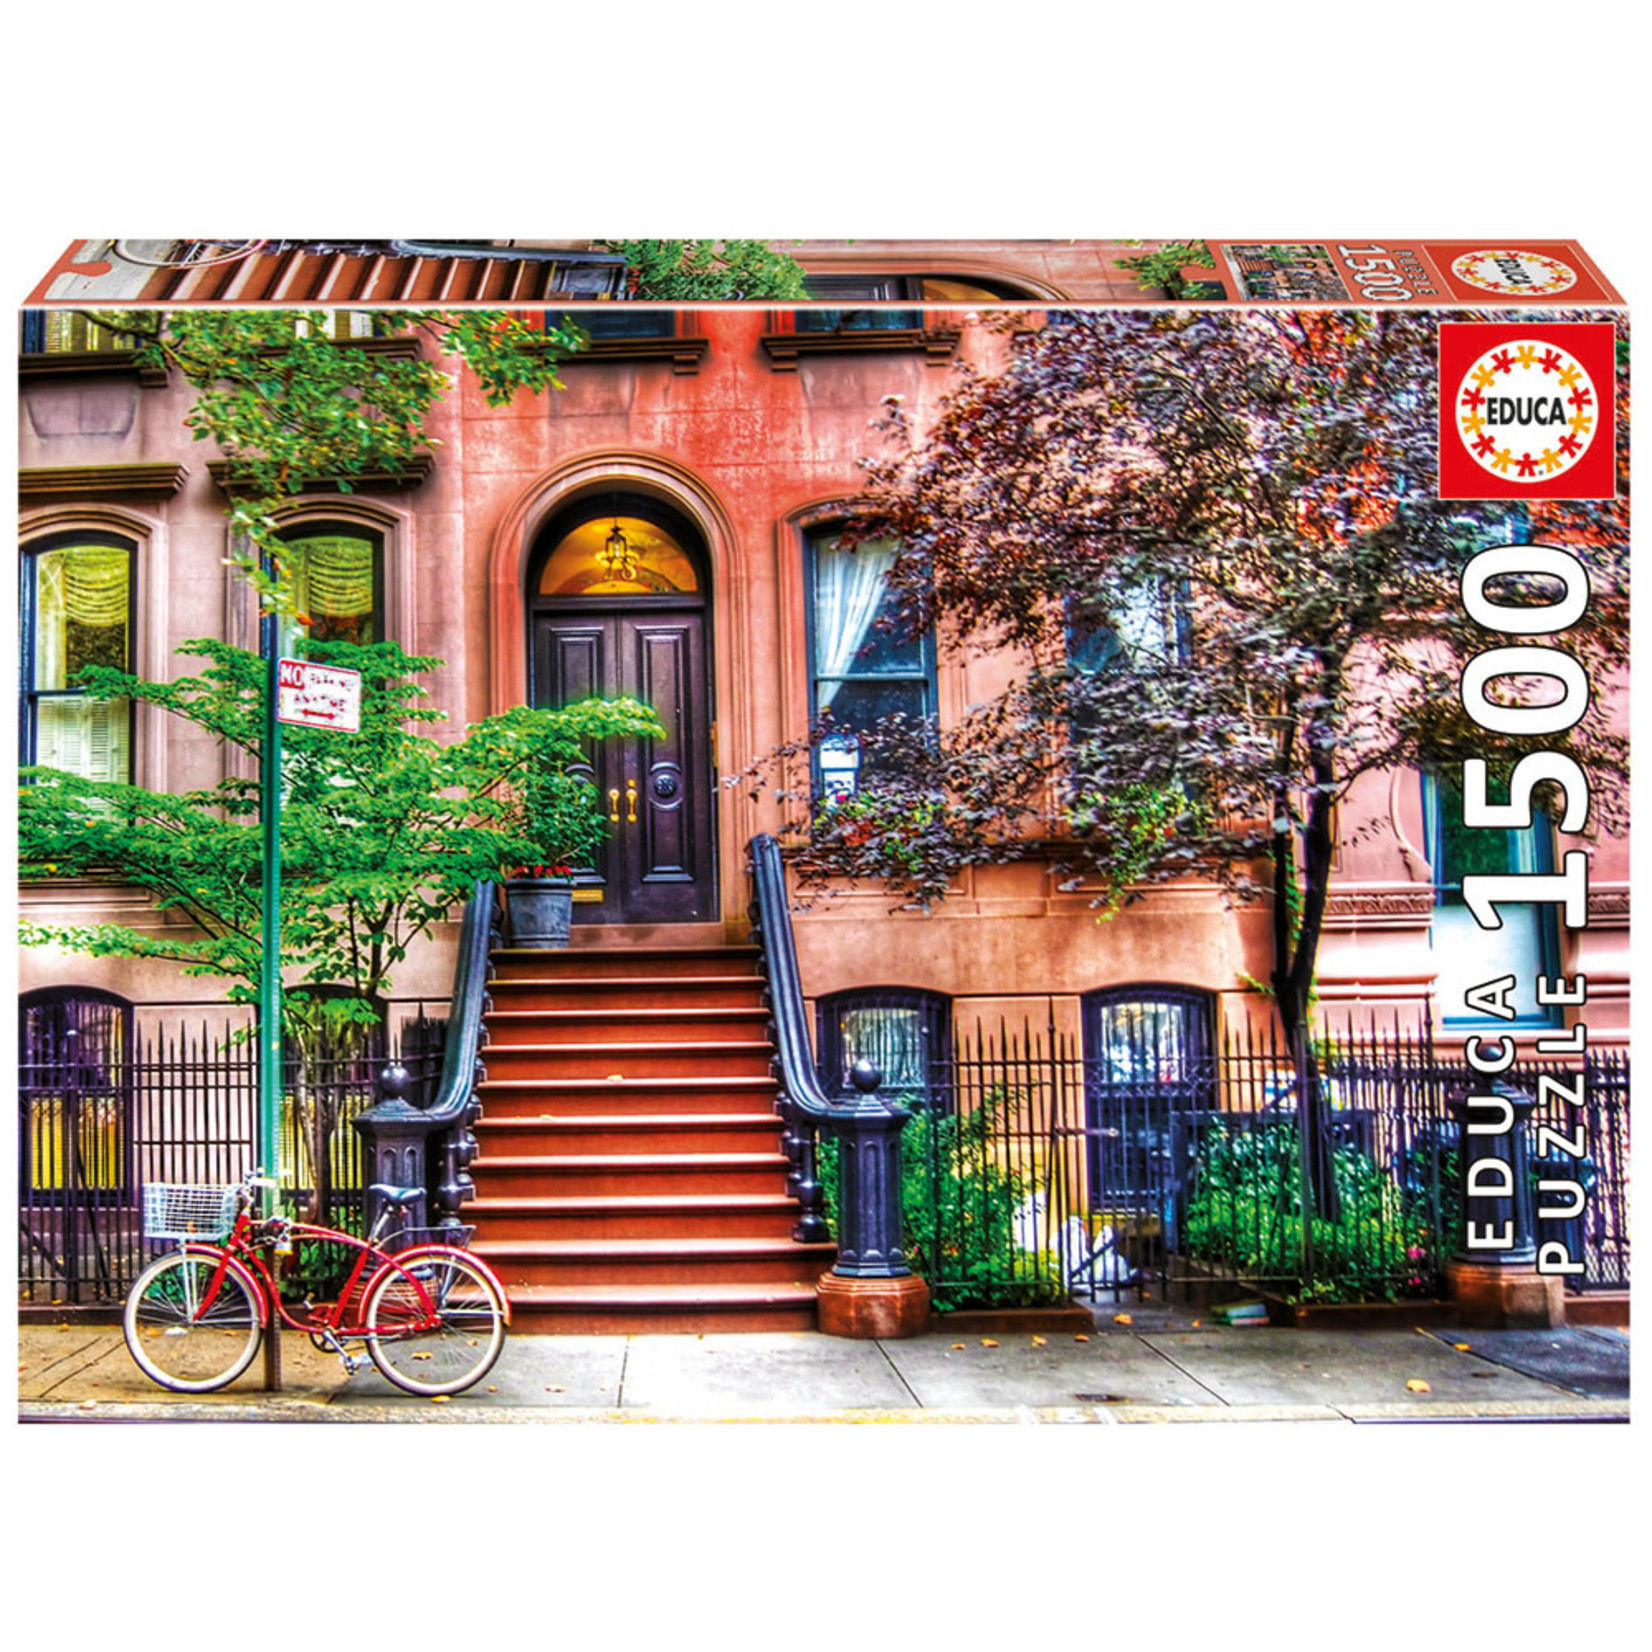 Educa Greenwich Village, New York